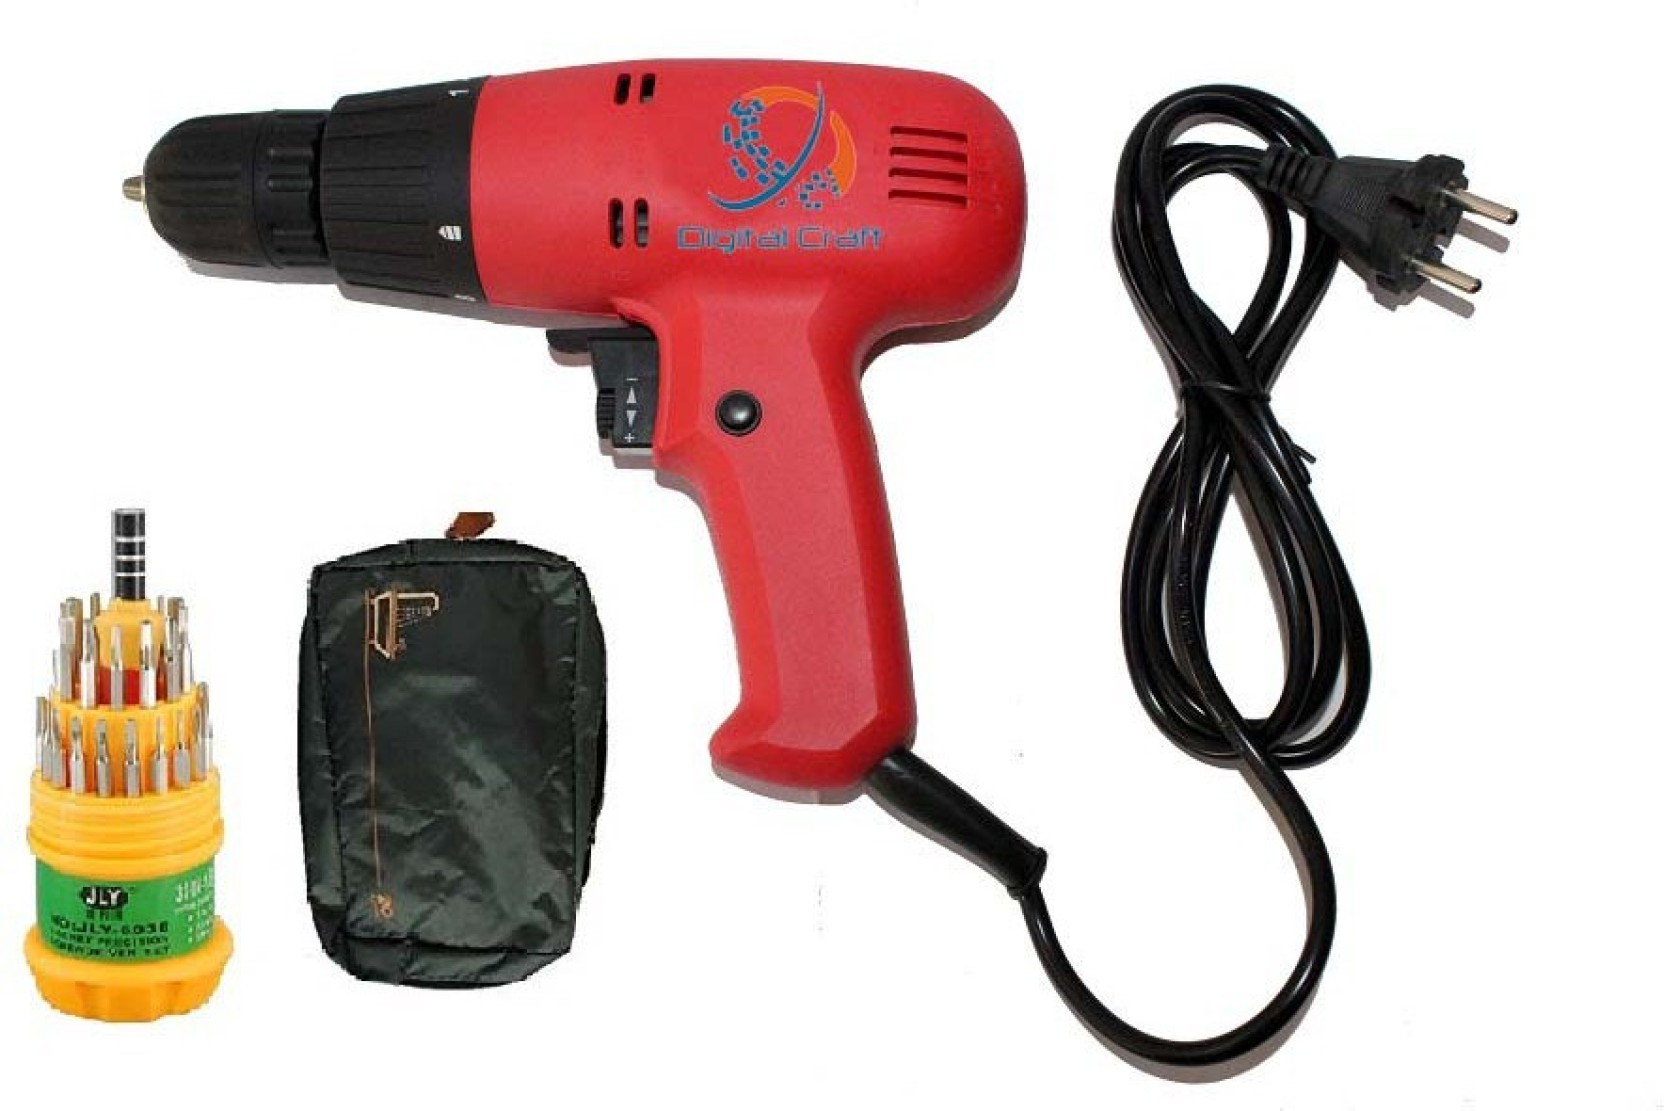 Network drill-screwdriver